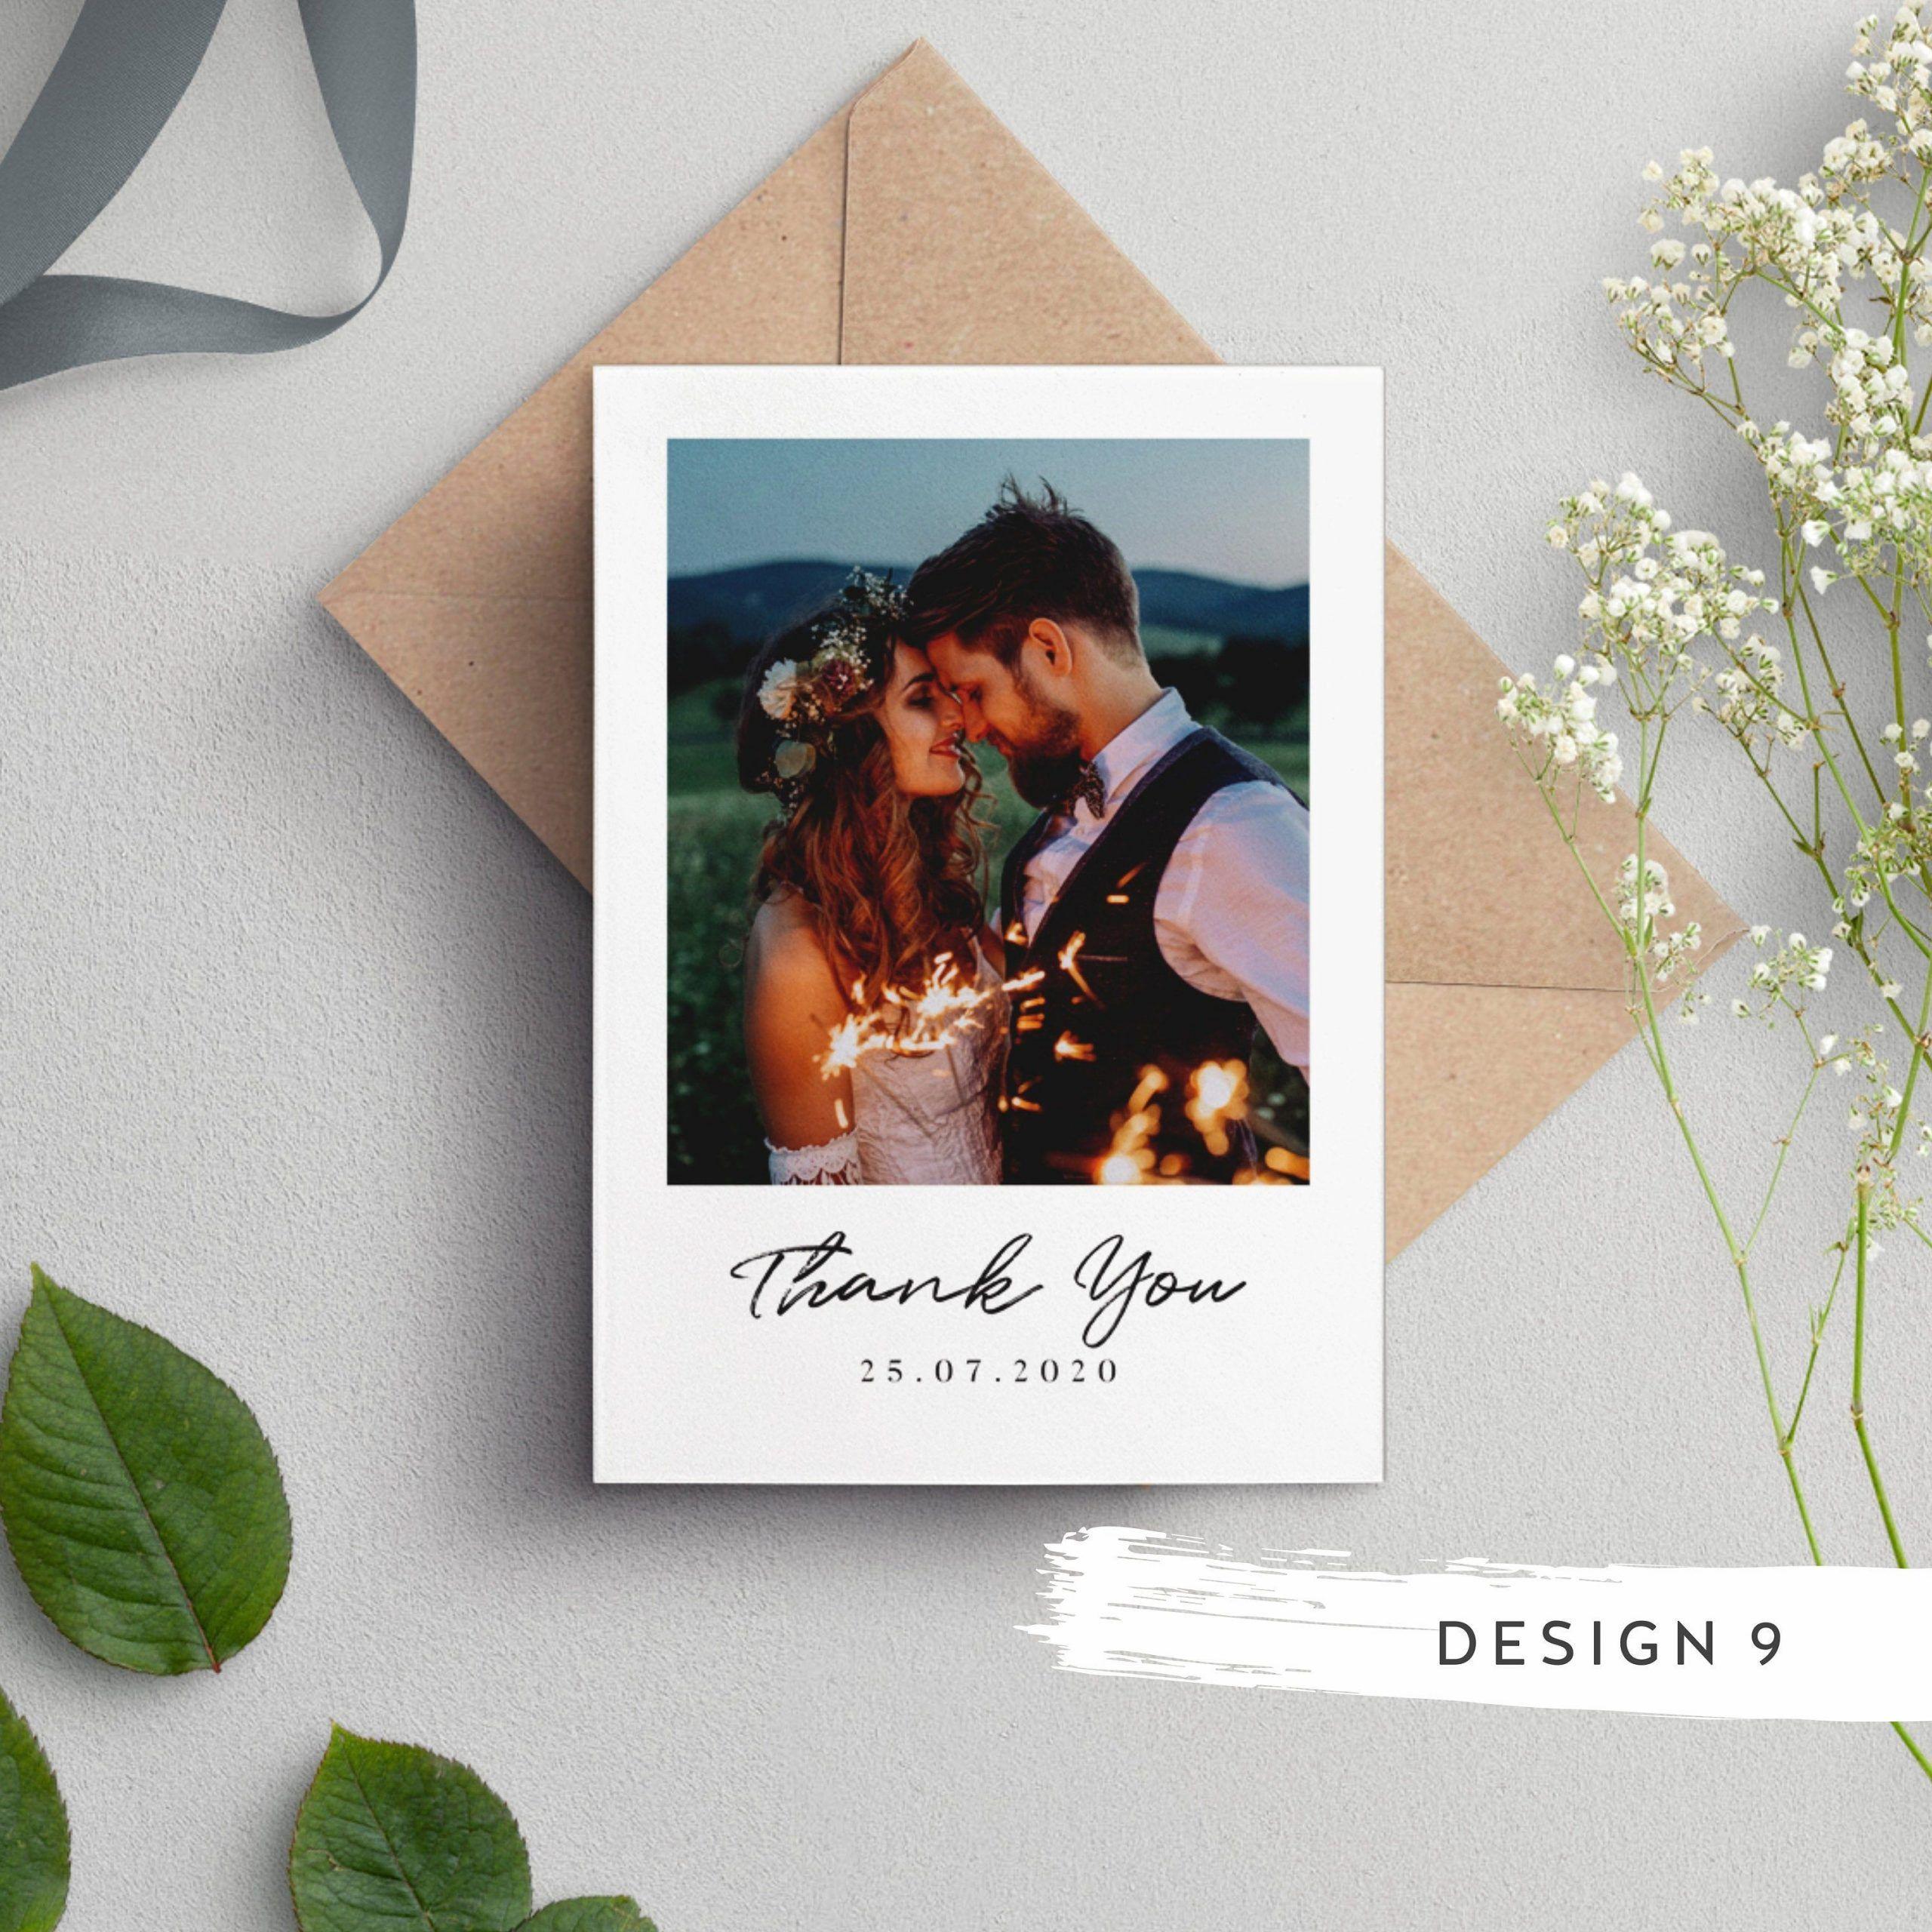 Wedding Thank You Cards, Wedding Thank You Cards With Photo, Thank You Cards, Personalised Wedding Thank You Card, Wedding Picture Card #087#card #cards #personalised #photo #picture #wedding